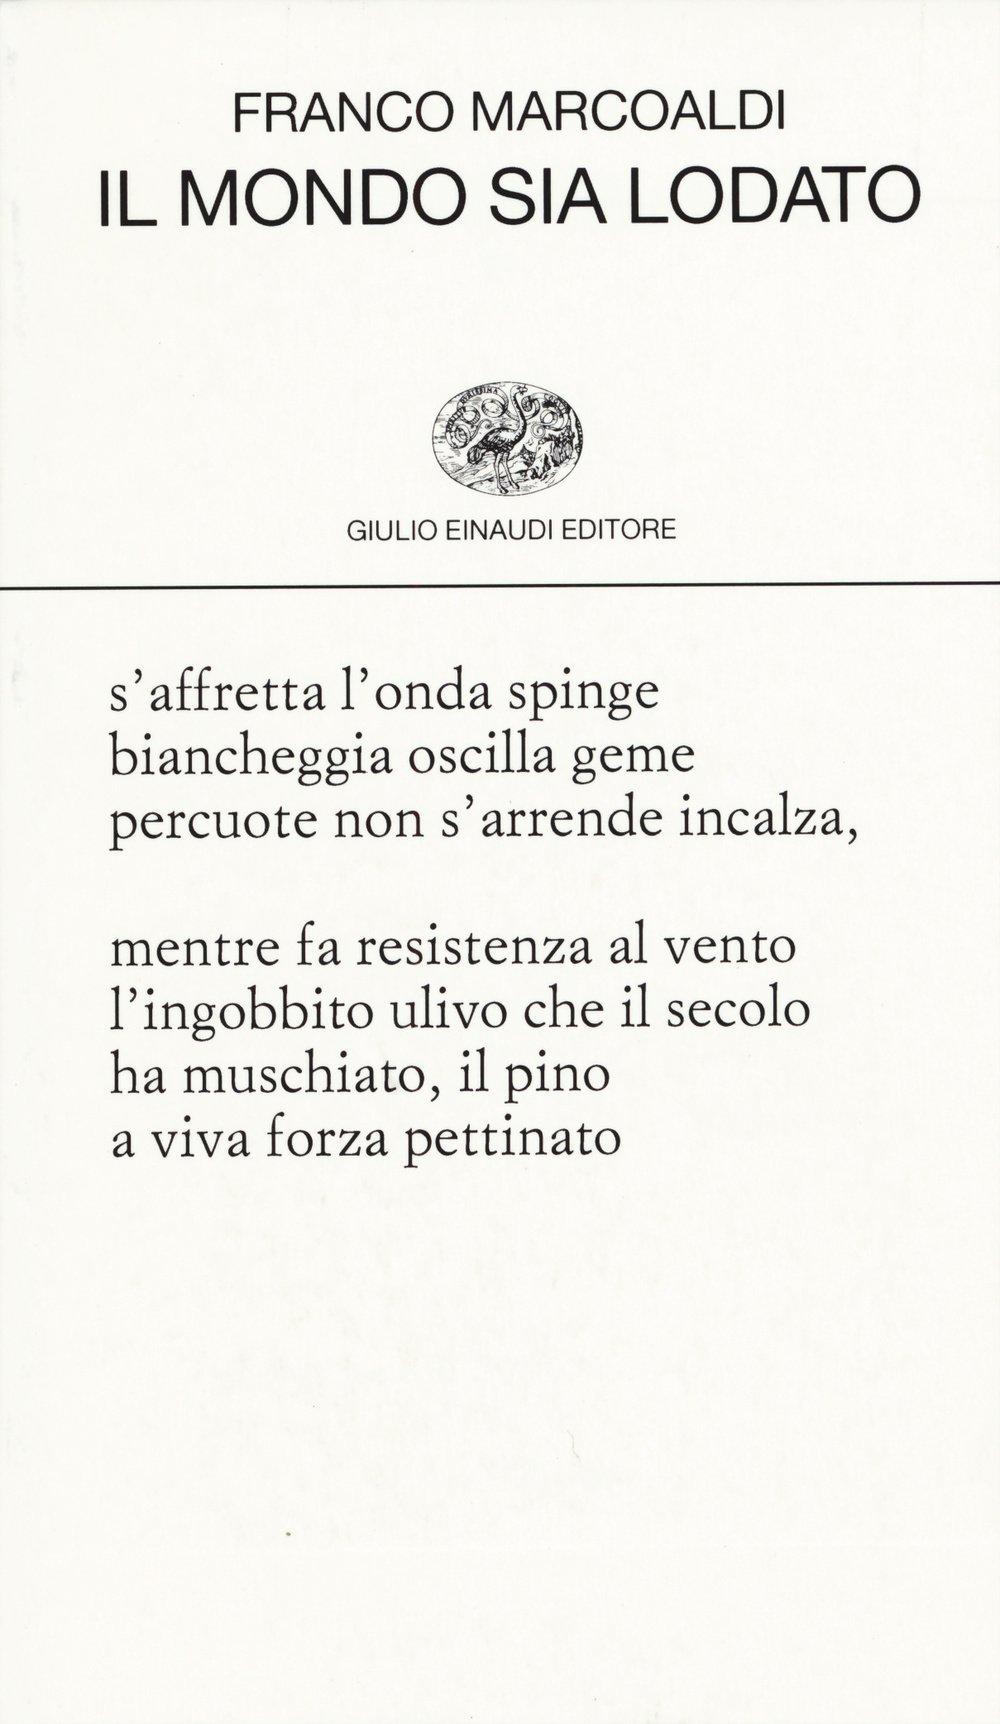 Franco Marcoaldi, Einaudi